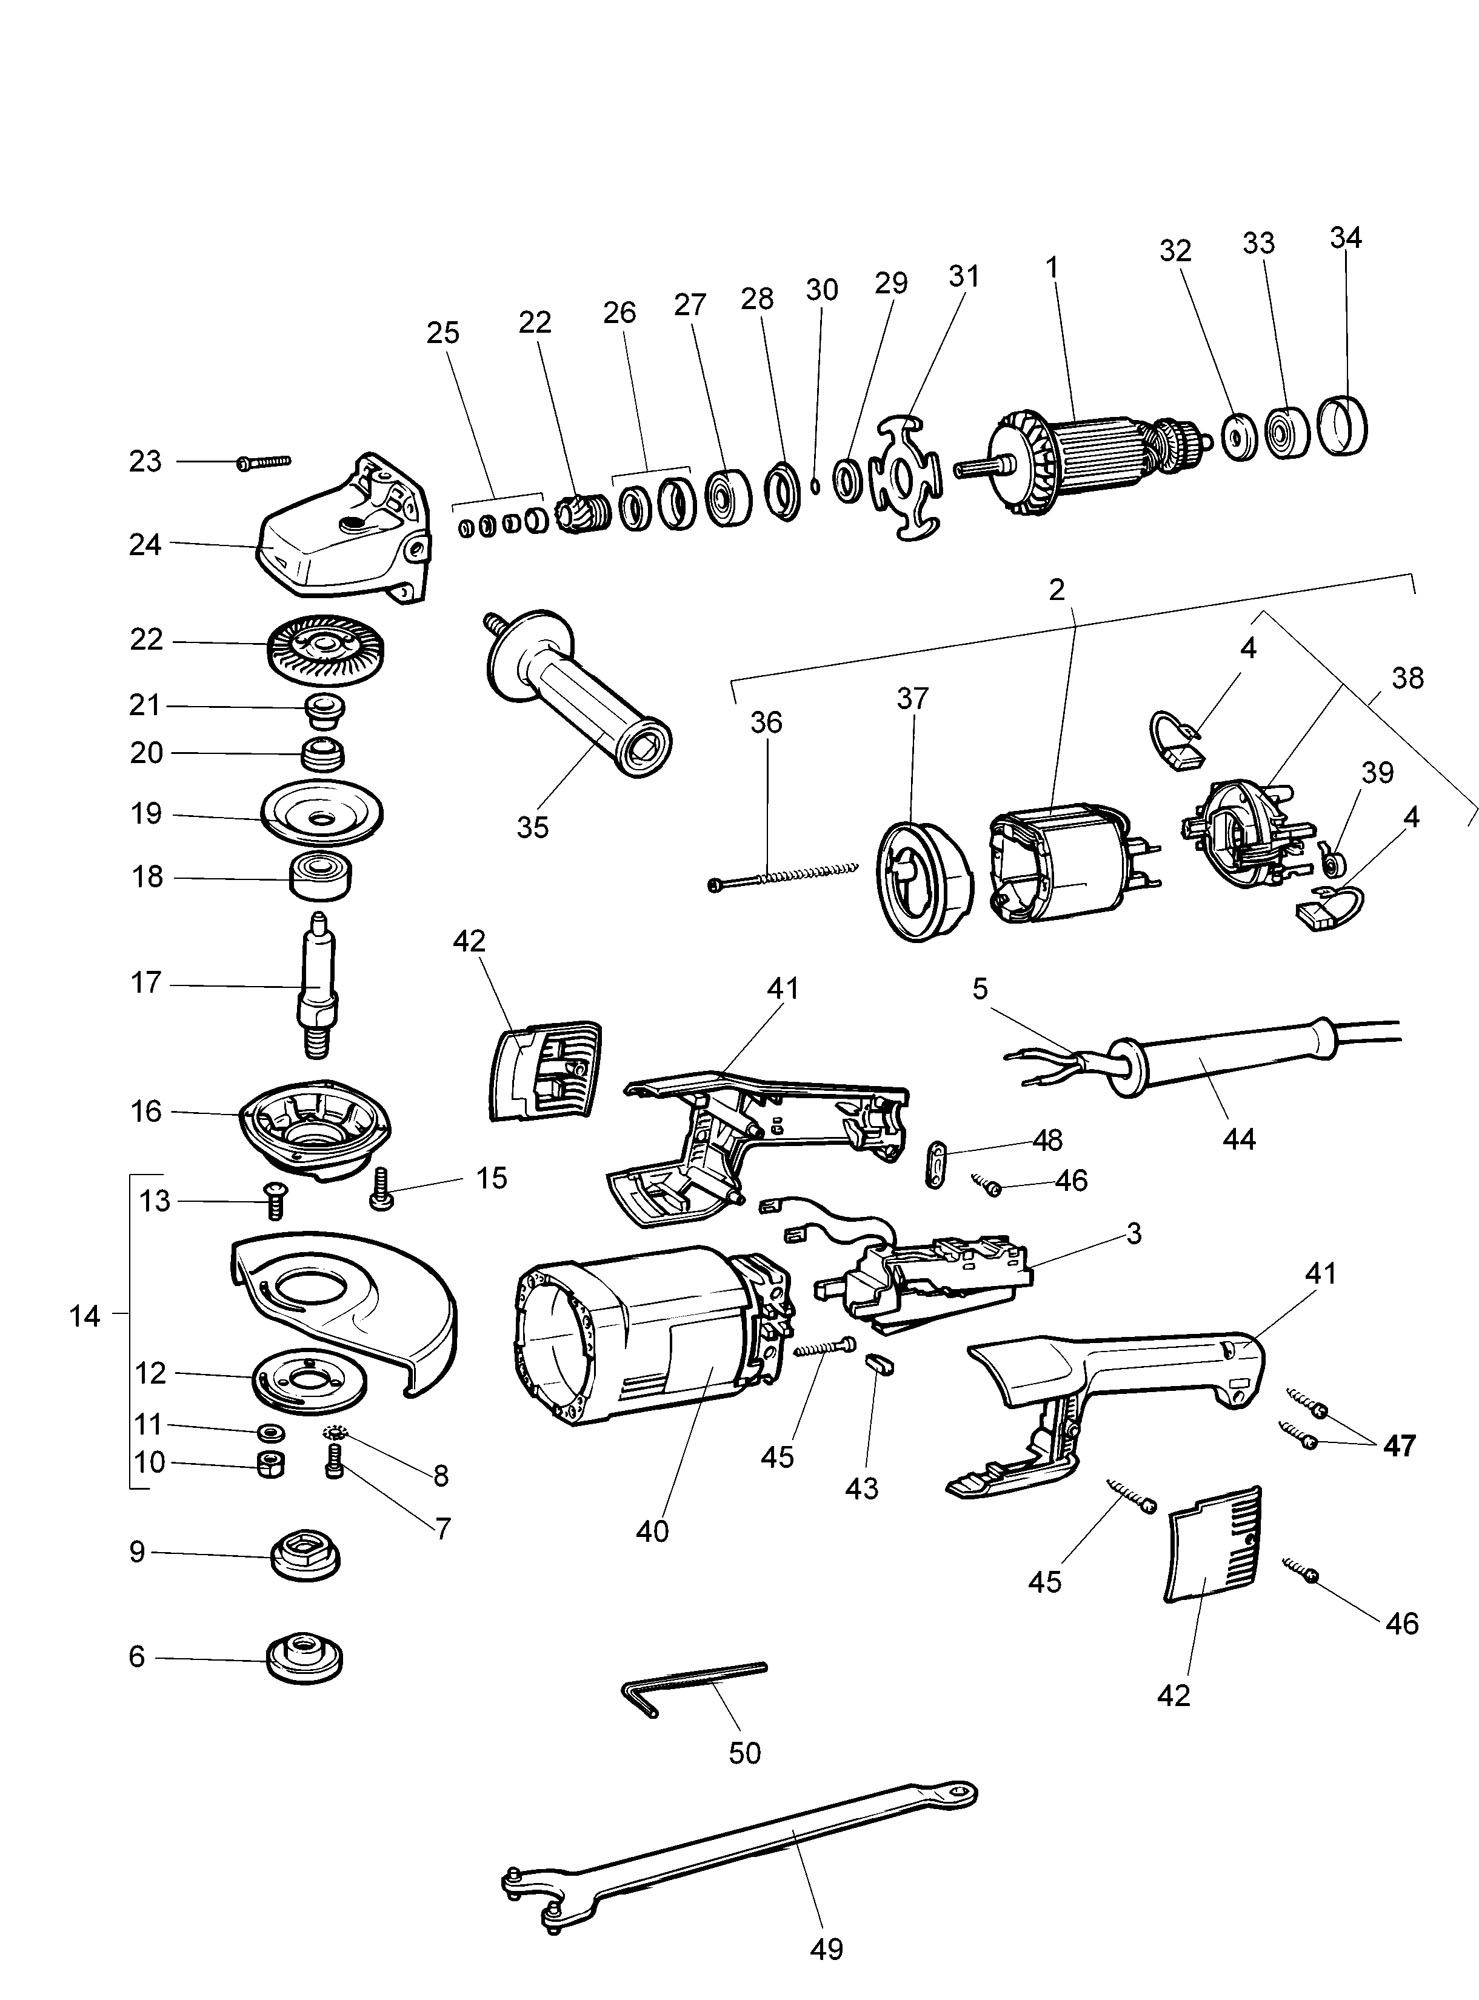 Spares For Elu Ws53e Angle Grinder Type 1 Spare Ws53e